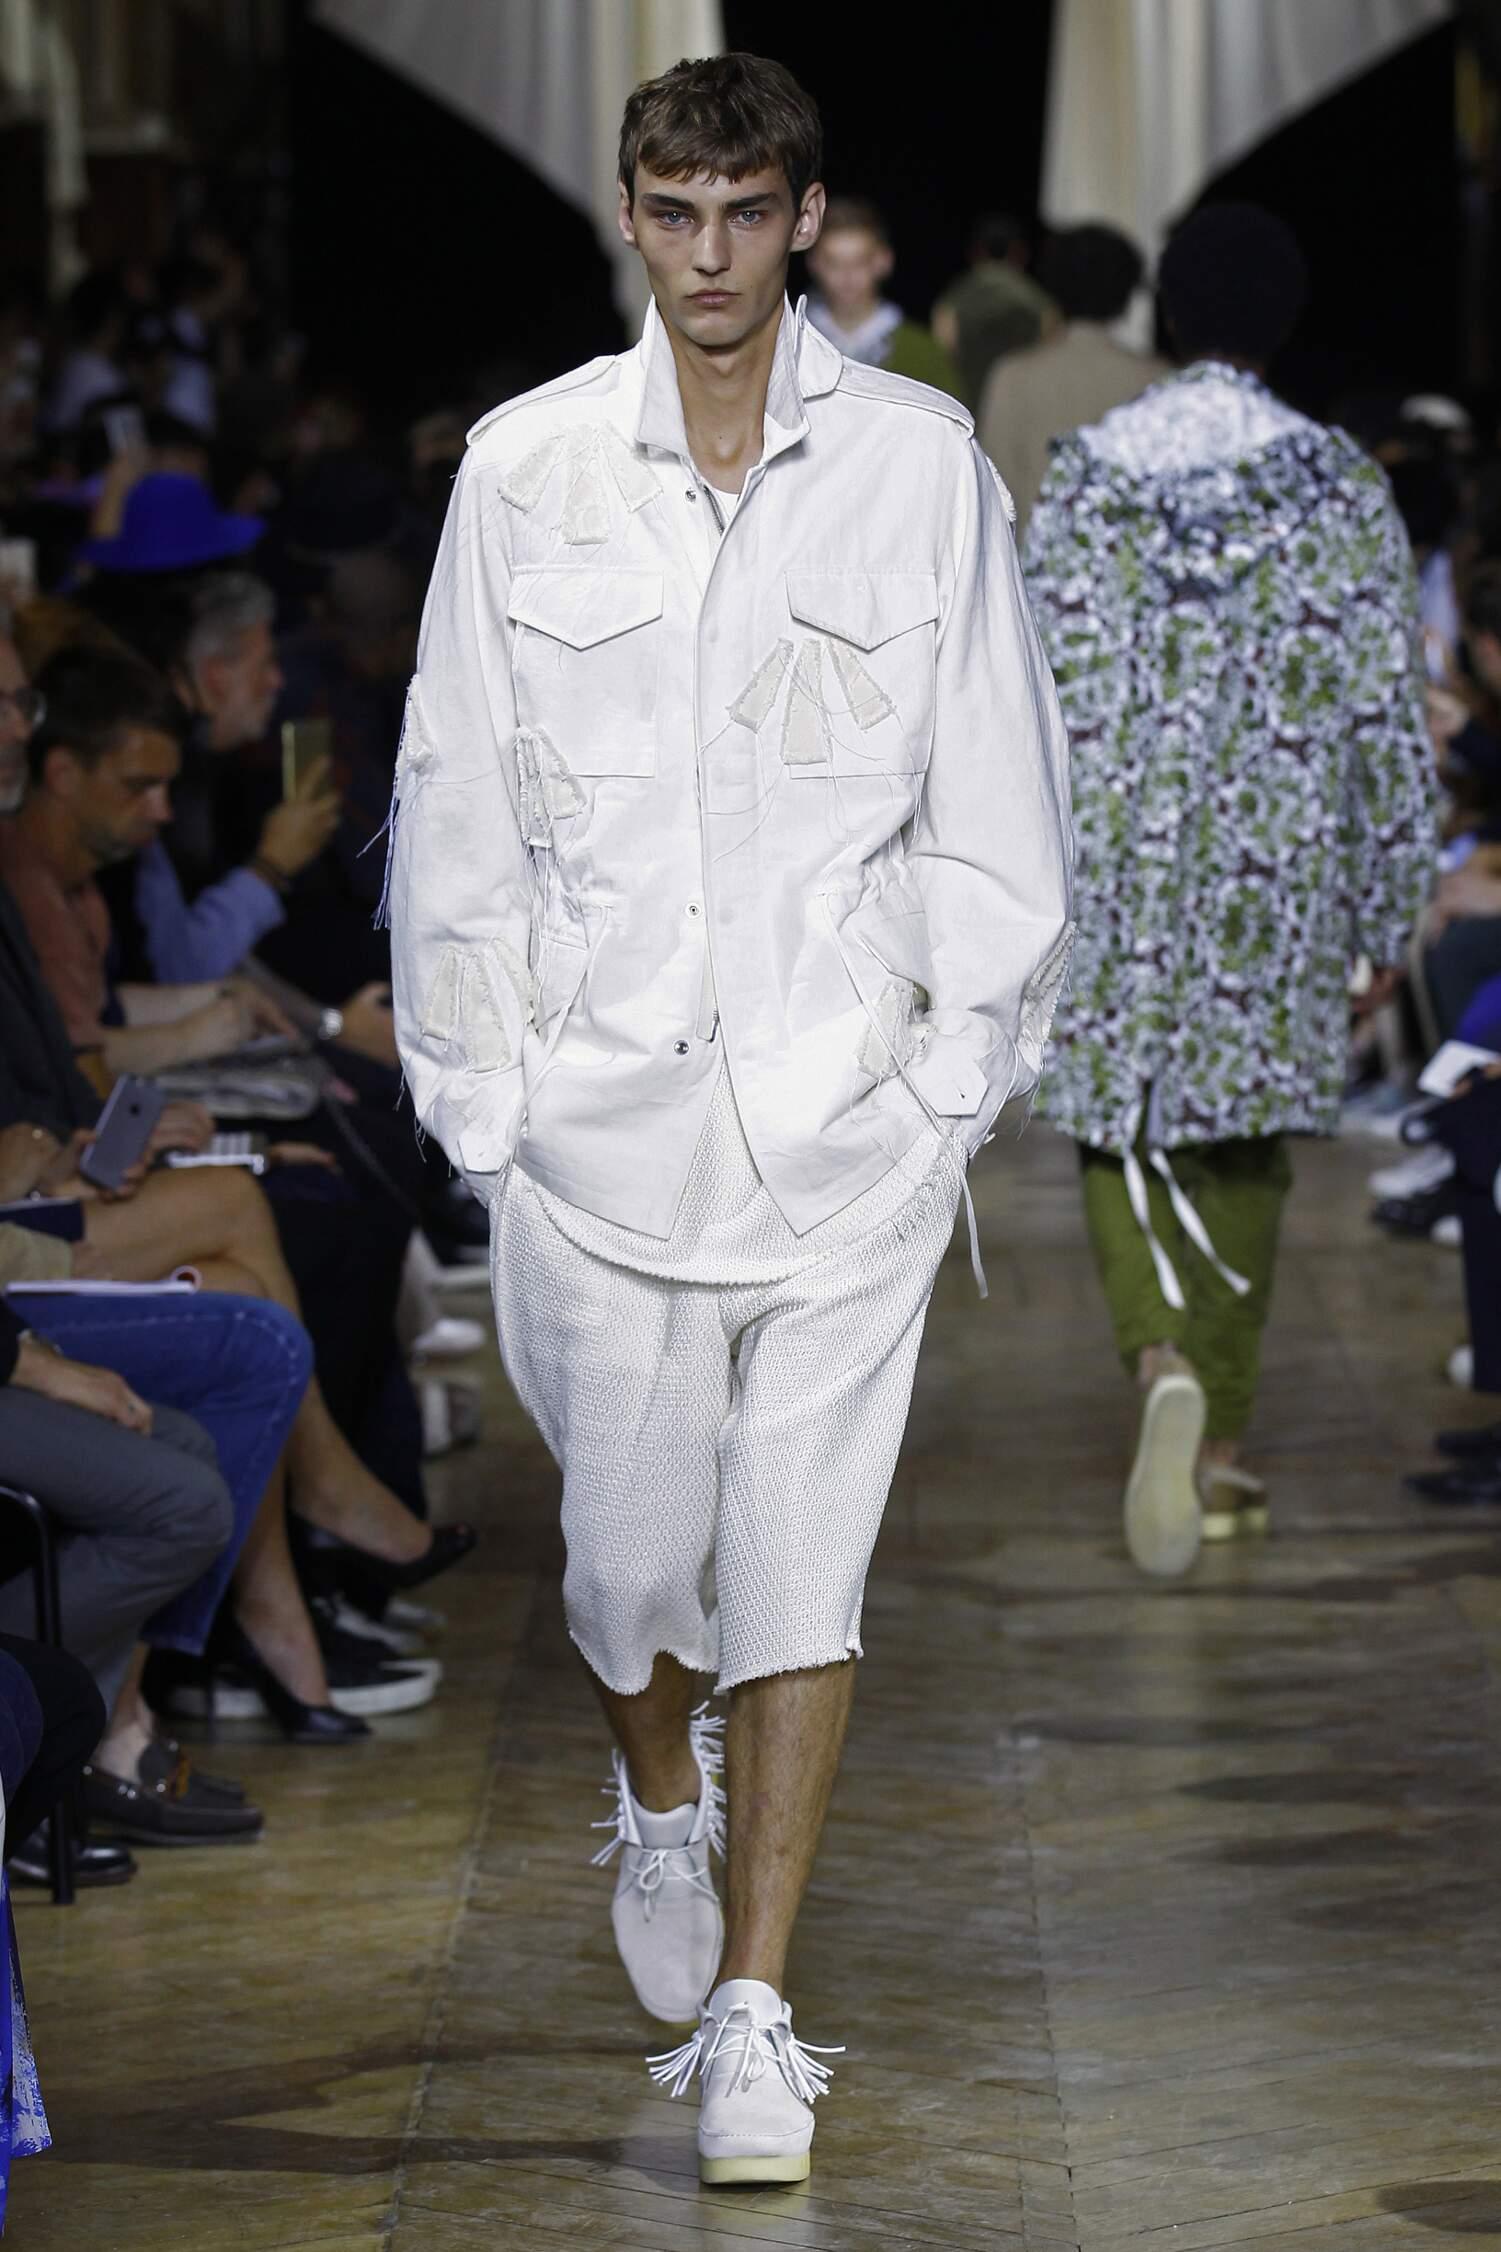 Spring Phillip Lim Collection Fashion Men Model